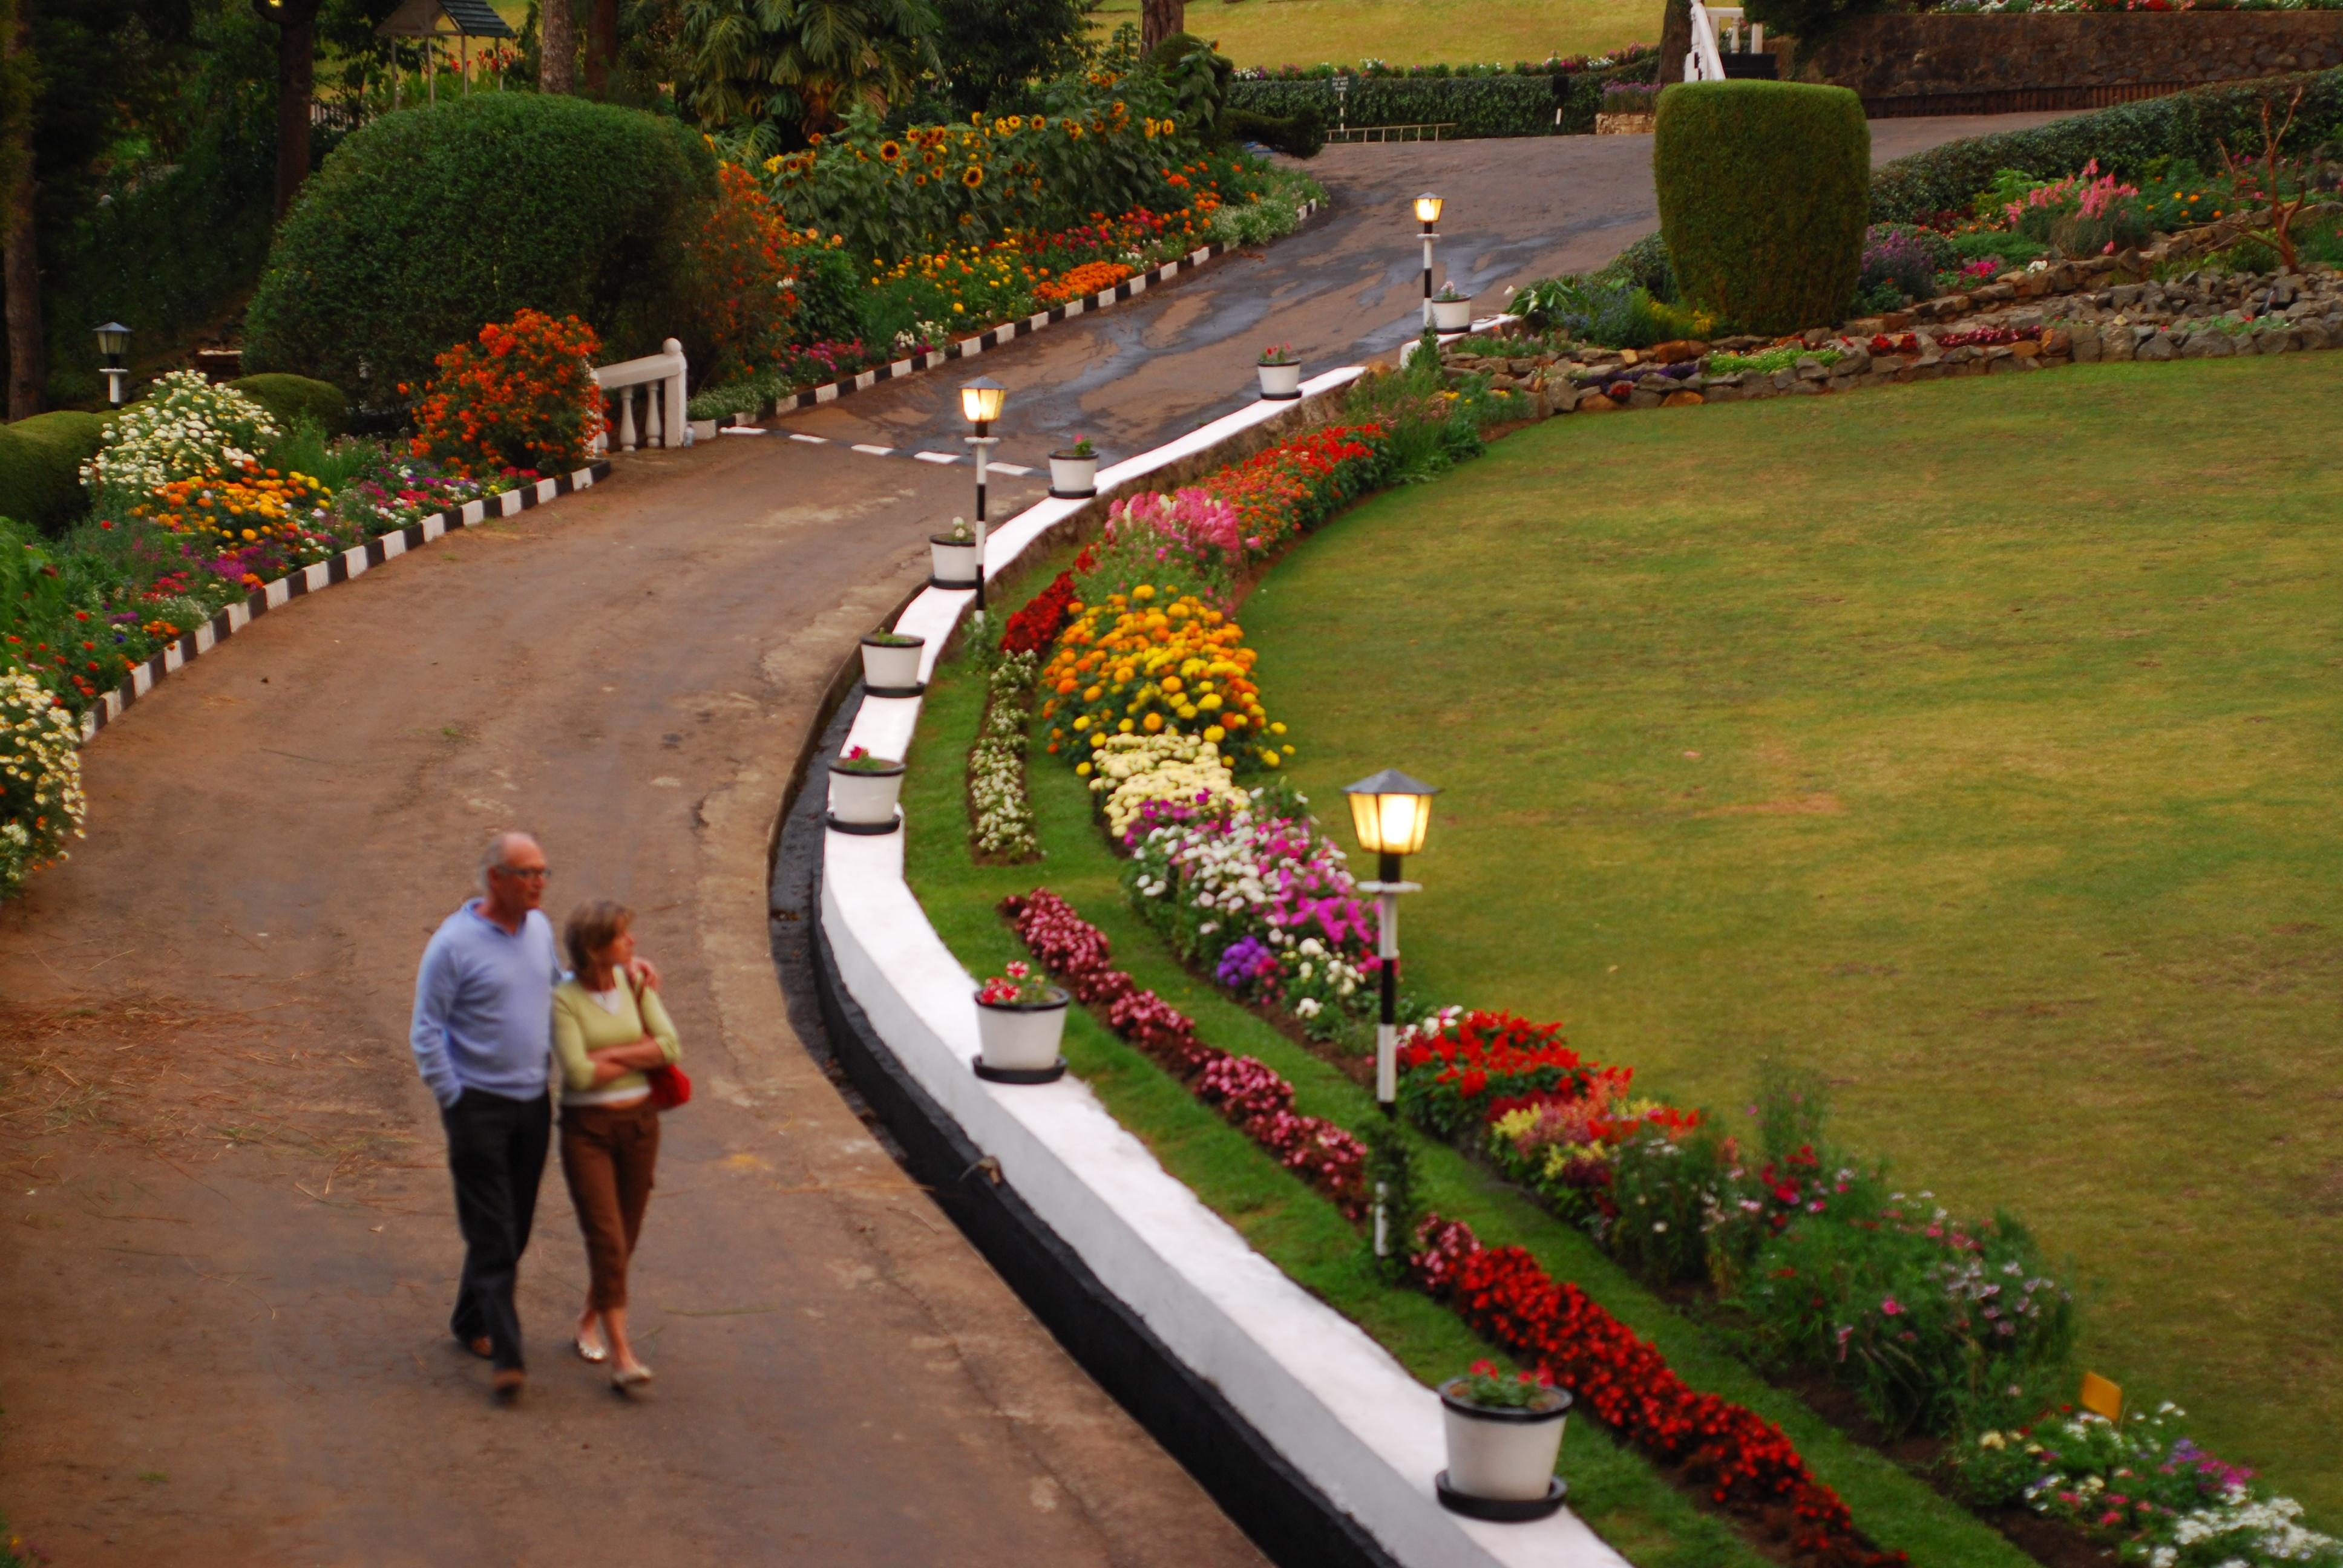 Garden Romance | Sri Lanka Travel Blog